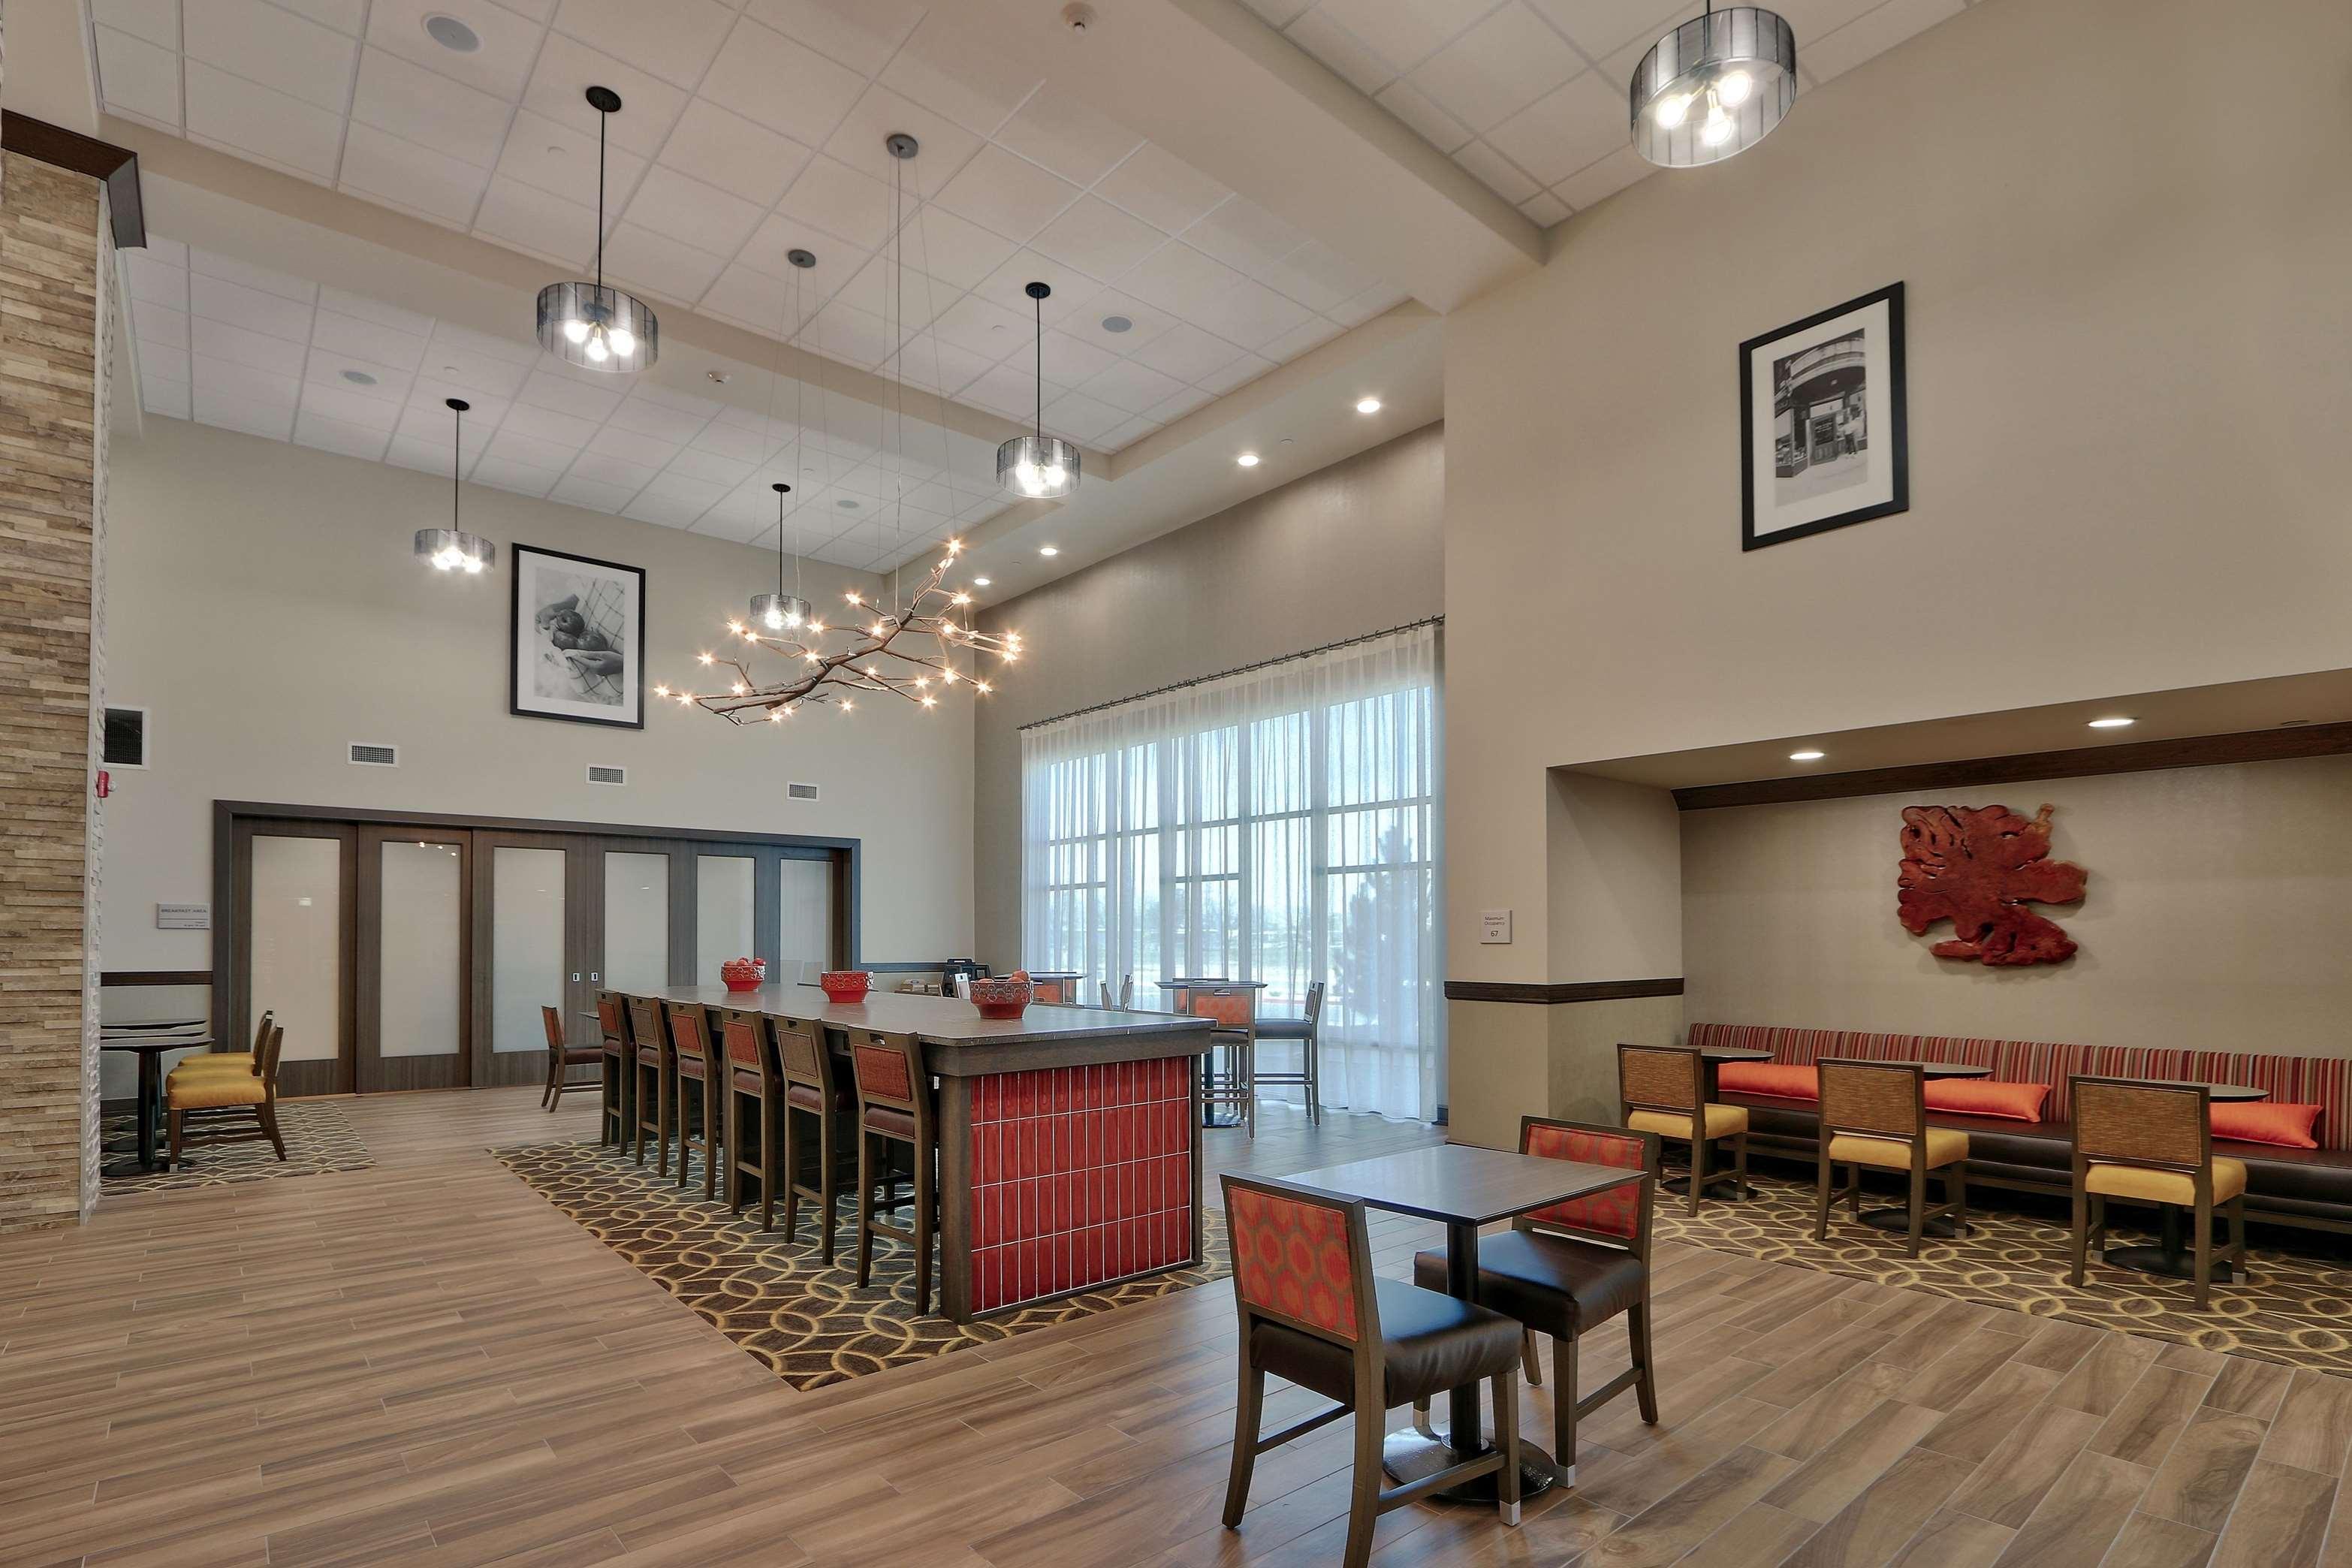 Hampton Inn & Suites Artesia image 18